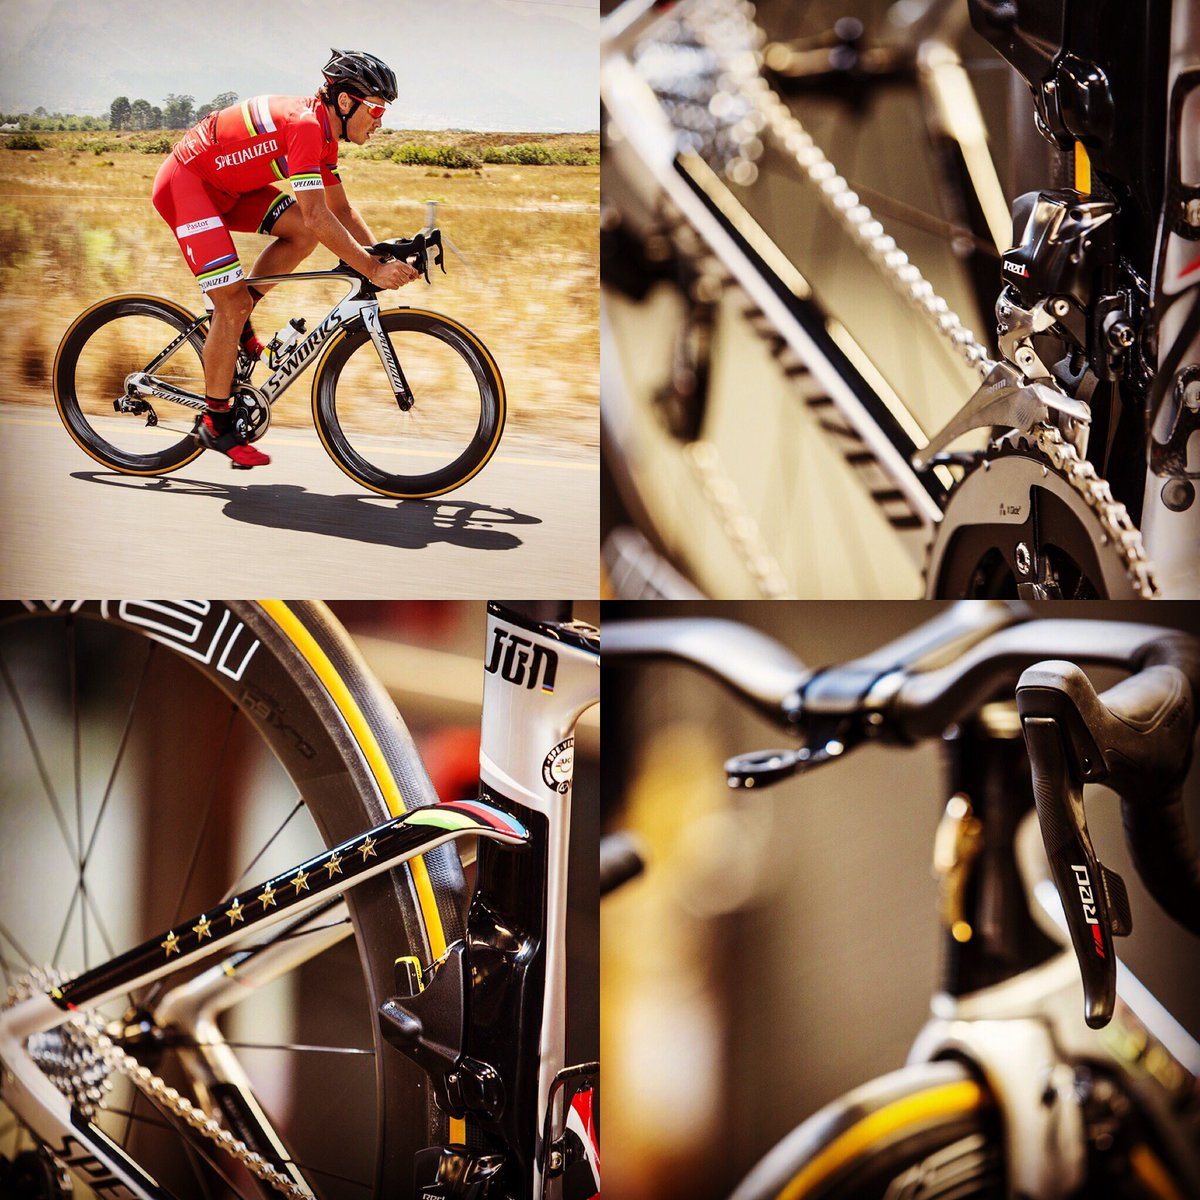 Five-time #ITU World Champion, @jgomeznoya, got his new bike: Specialized Venge ViAS SRAM RED #eTap